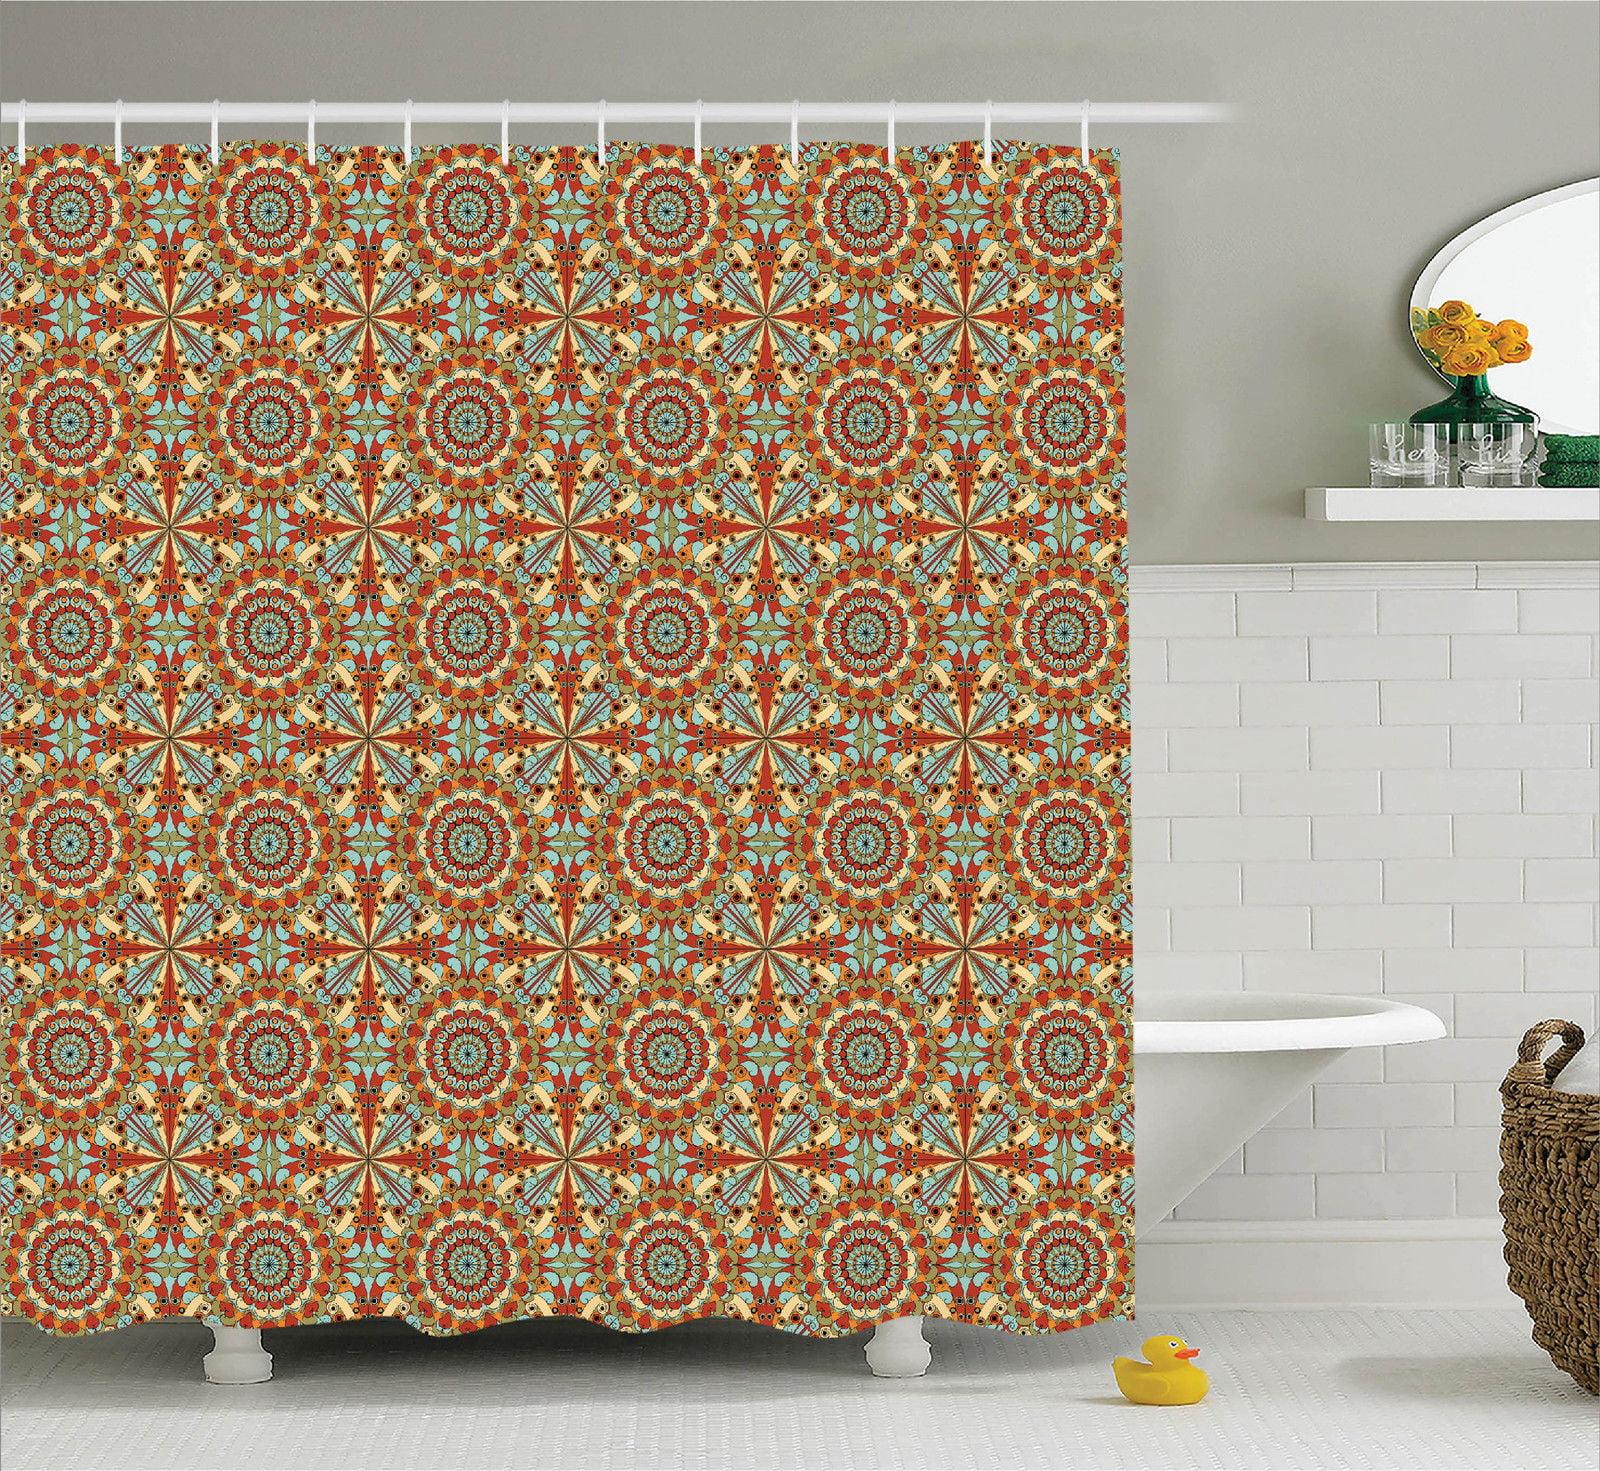 Arabian Decor Shower Curtain Set Colorful Geometric